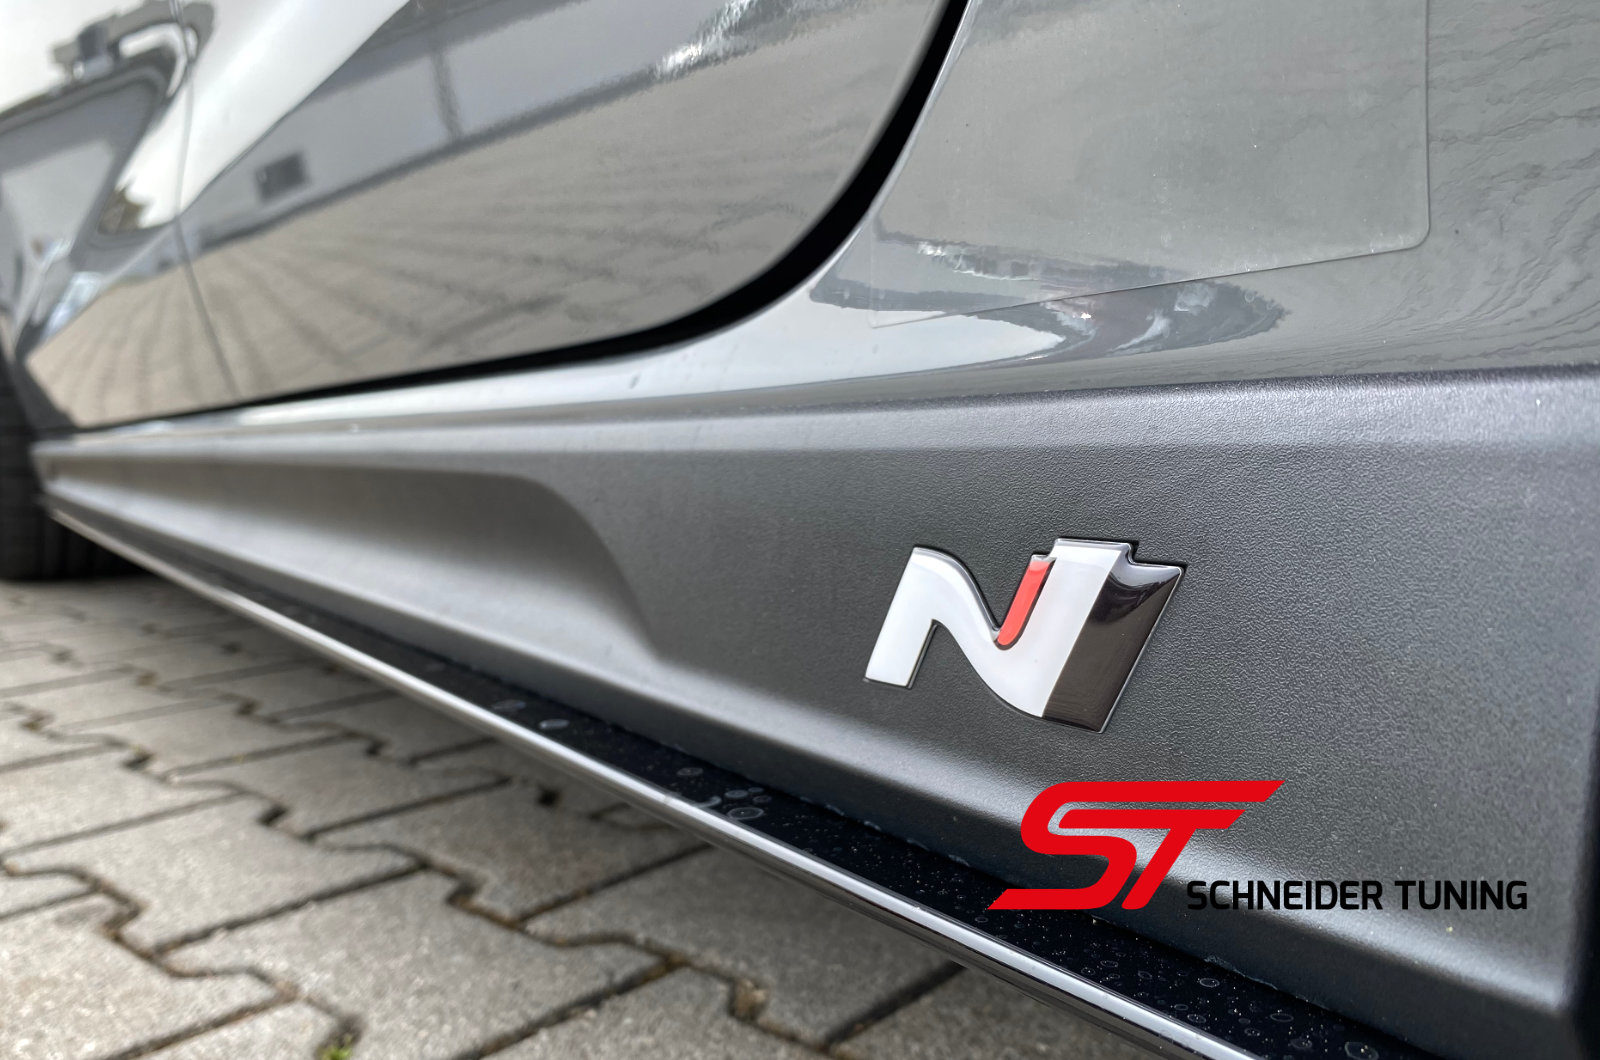 Hyundai-i30-N-logo-n-seite-Schneider-Tuning